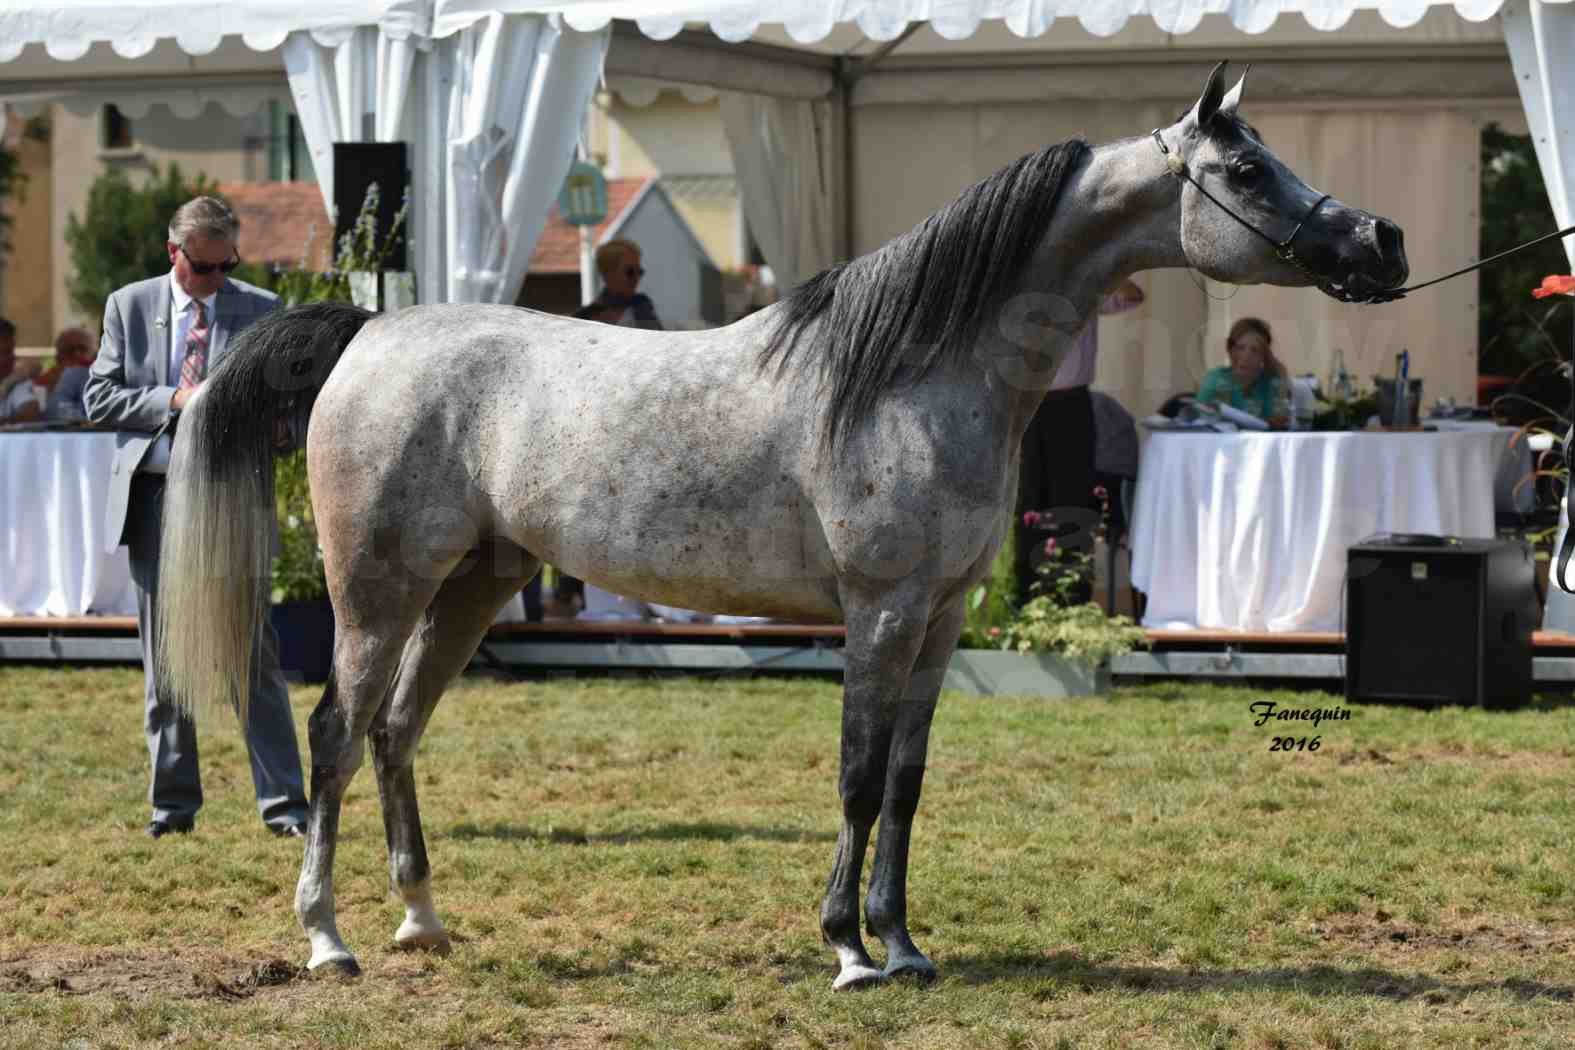 International Arabian Horse Show B de VICHY 2016 - ISABELLA - Notre Sélection - 09